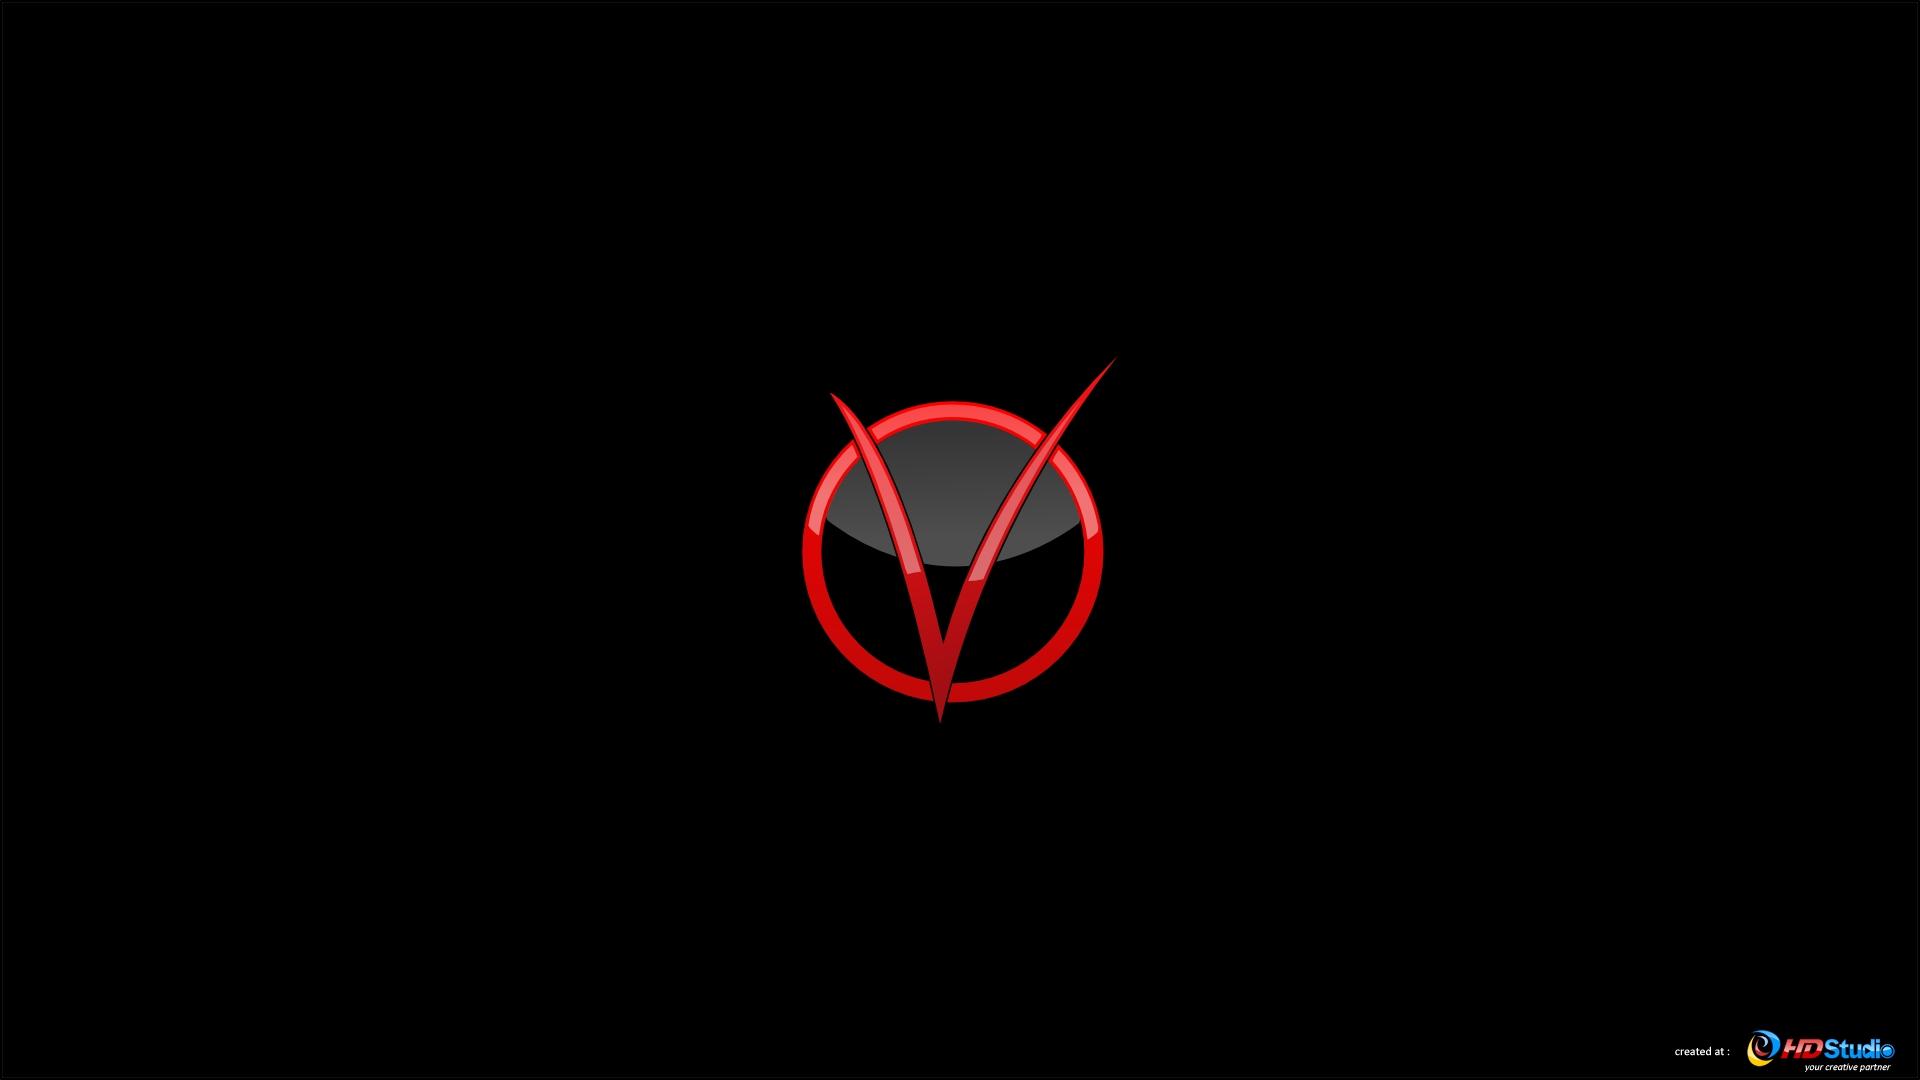 Free Download V For Vendetta By Hd Studio Desktop Wallpaper